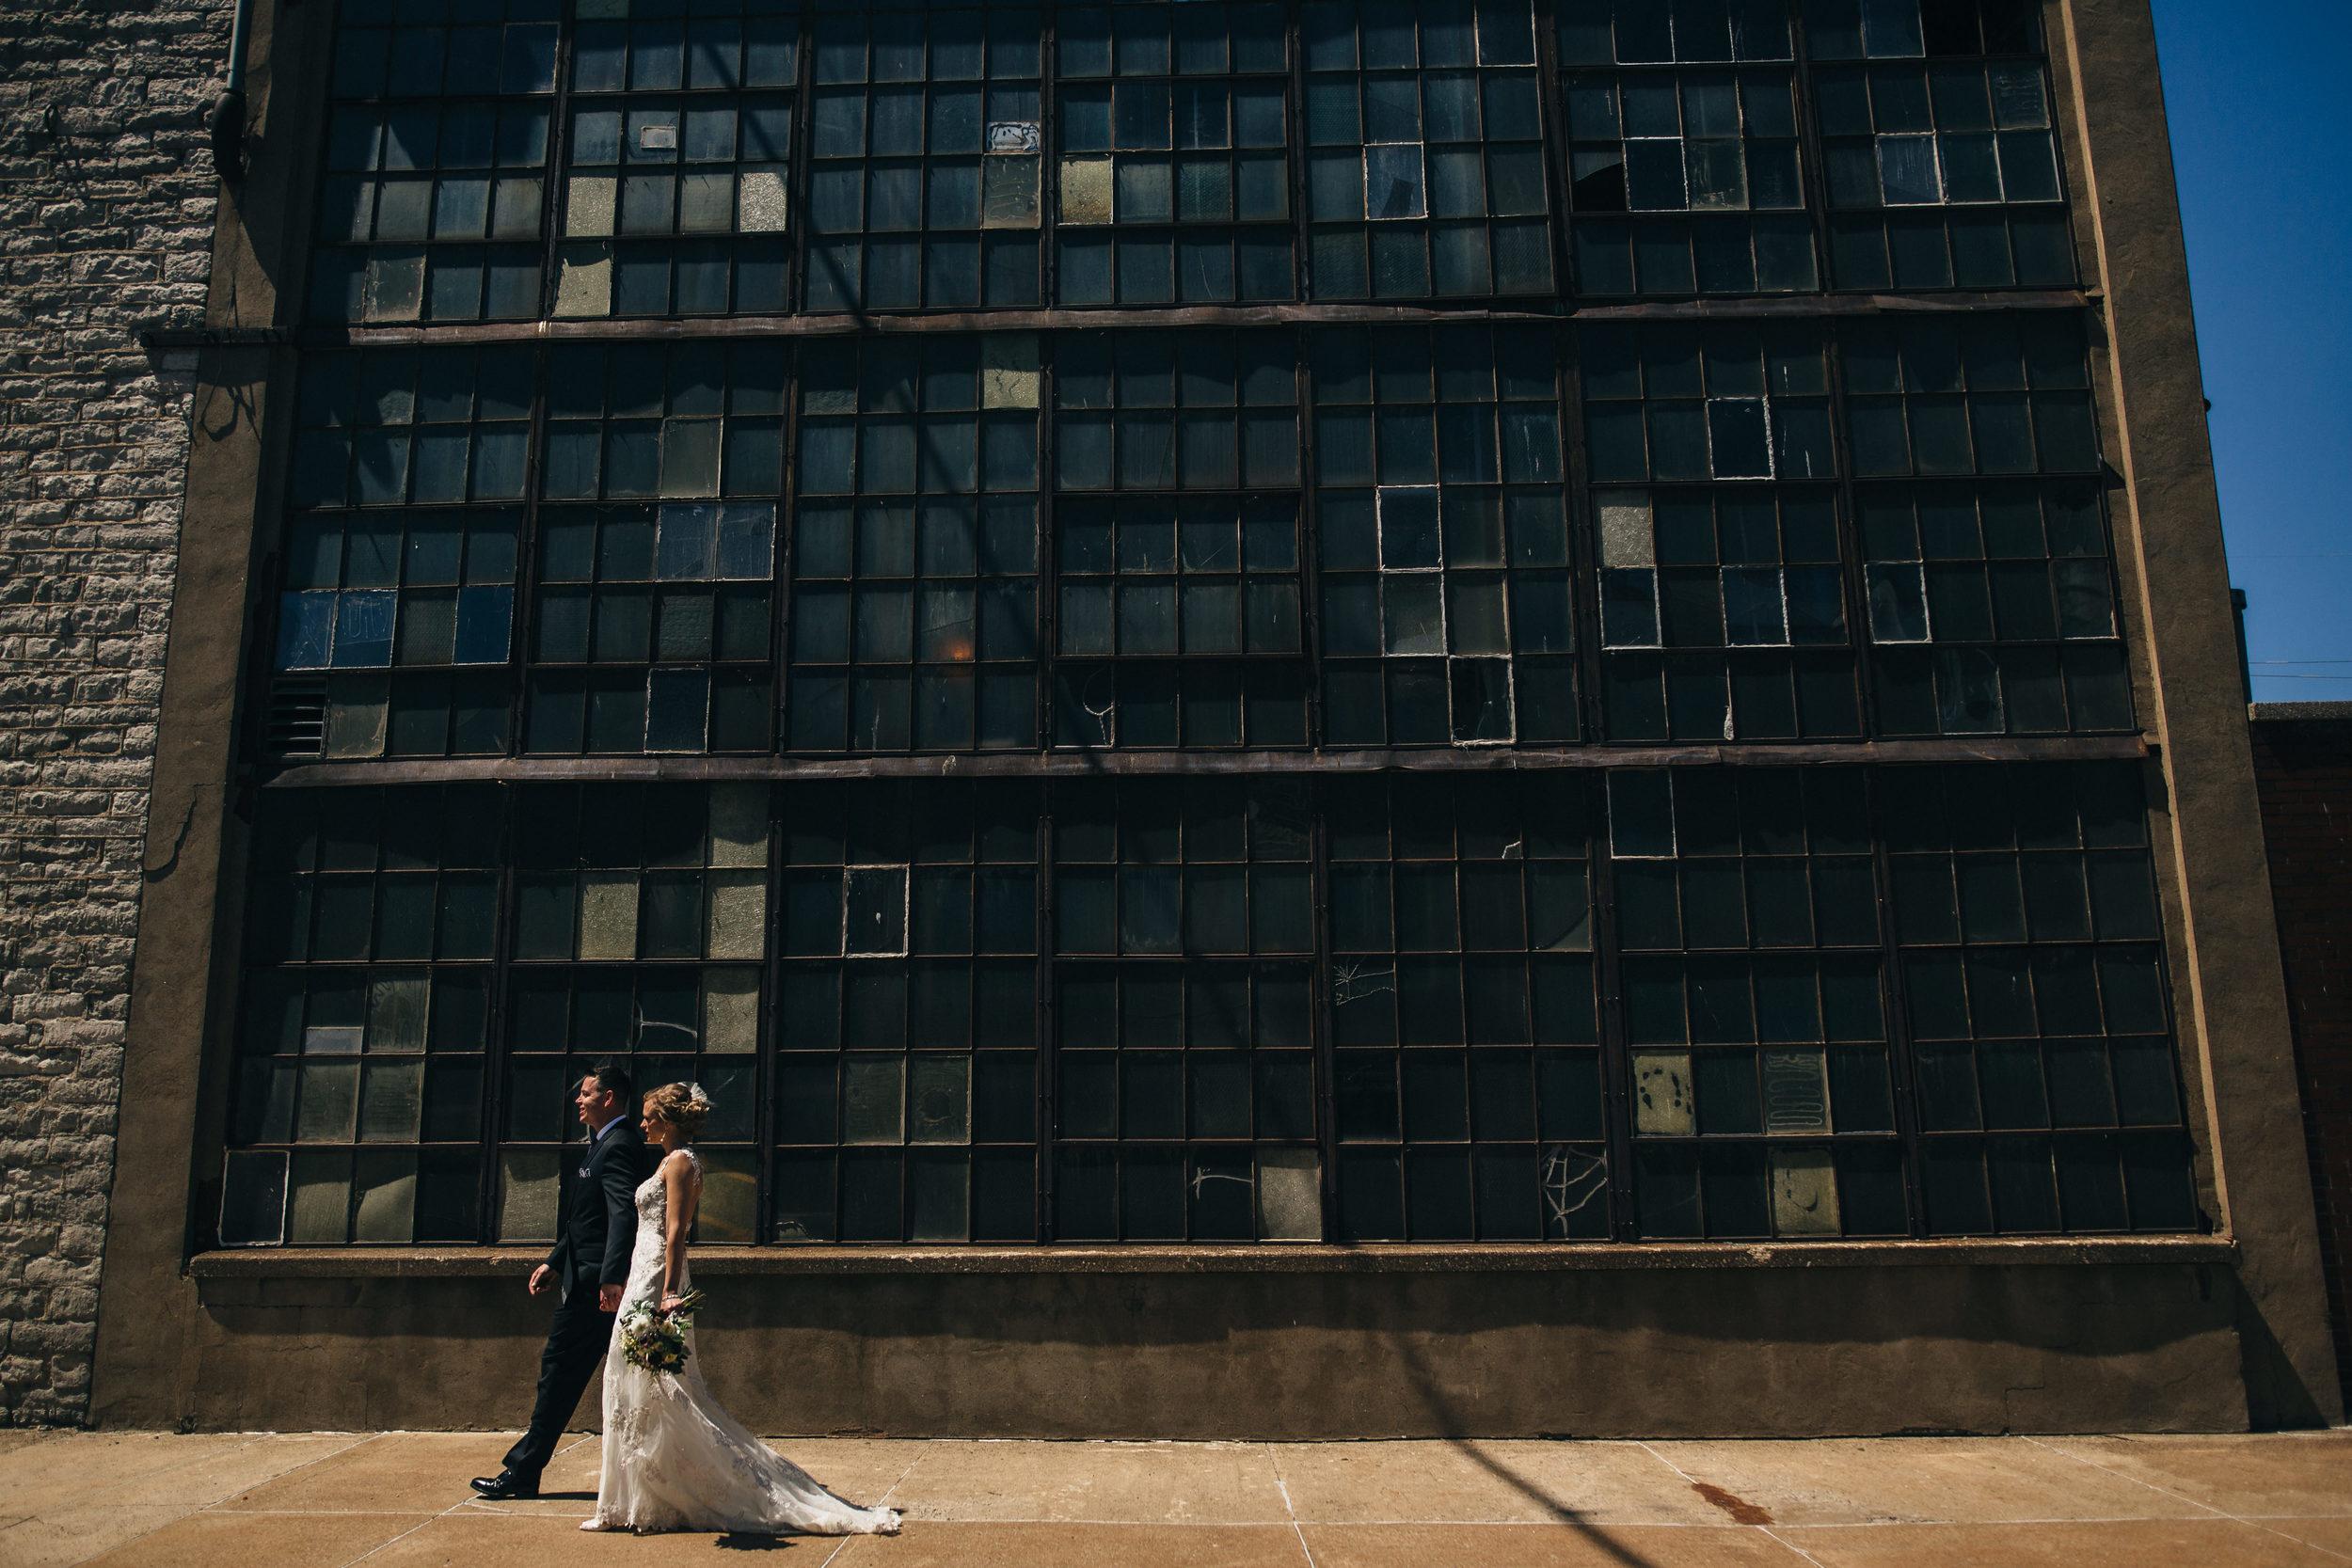 Bride and groom wedding photography in downtown Sandusky, Ohio.